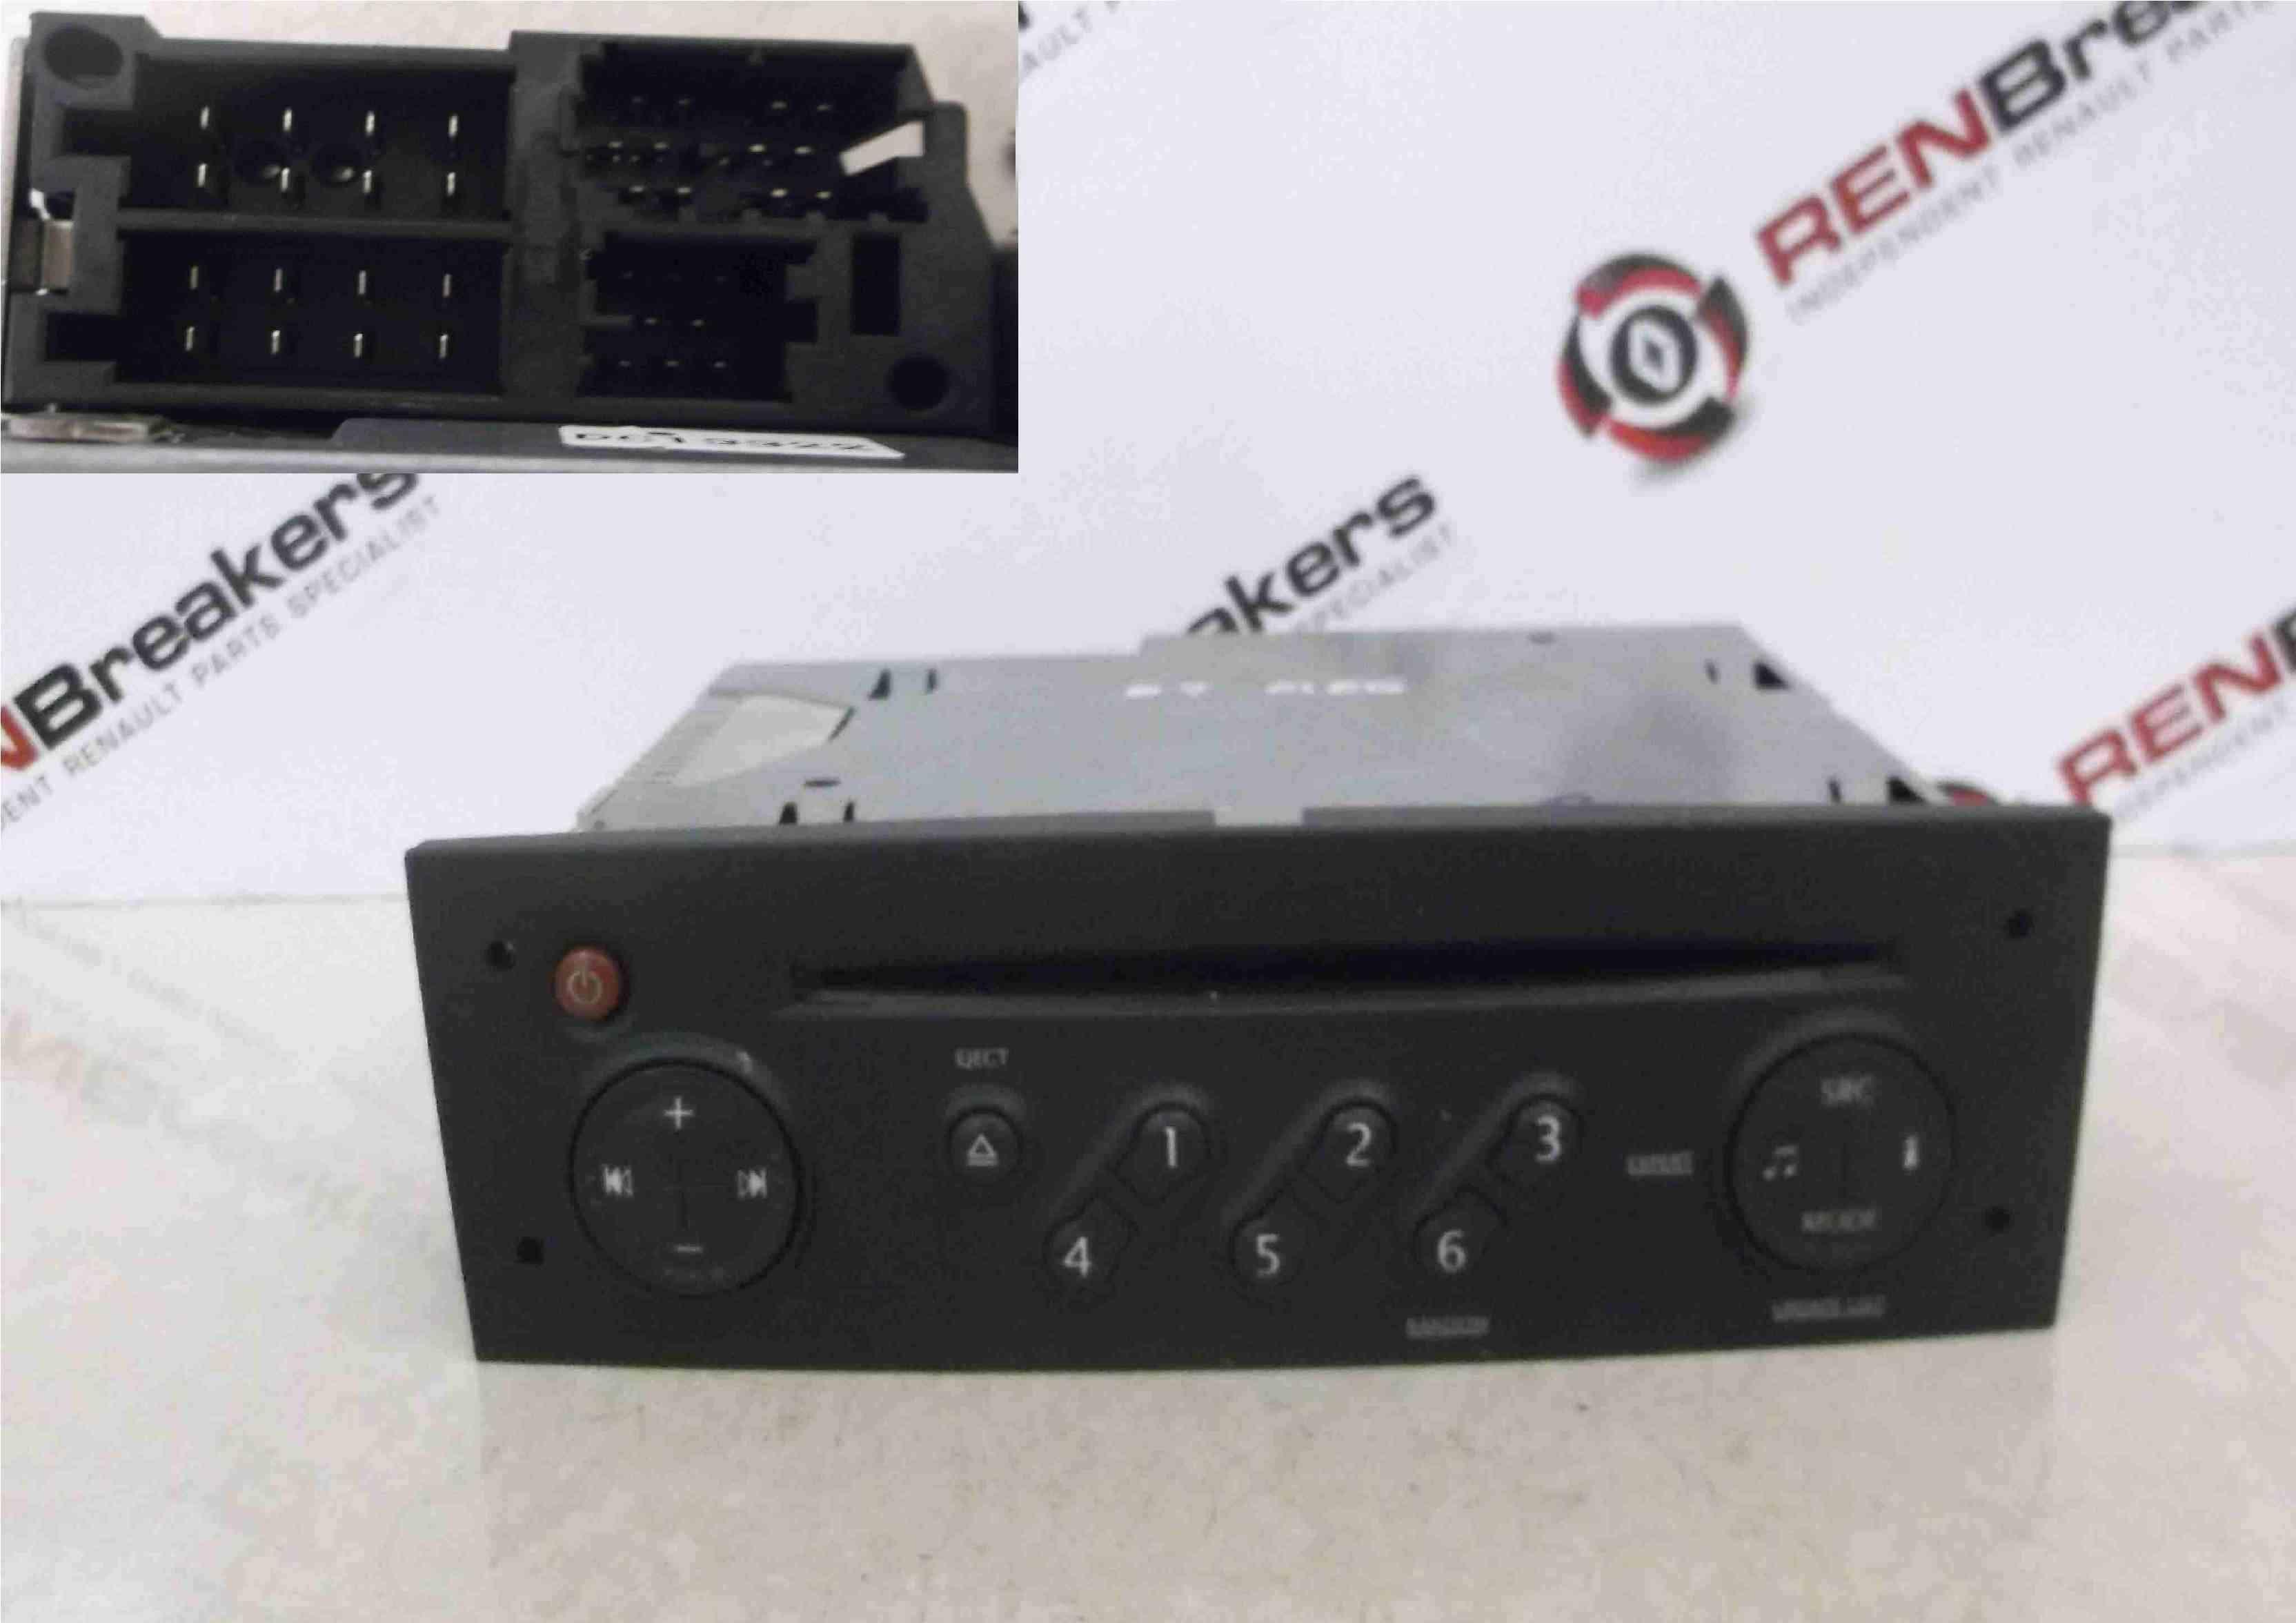 Renault Megane 2002-2008 Radio Cd Player Update List + Code 8200607918